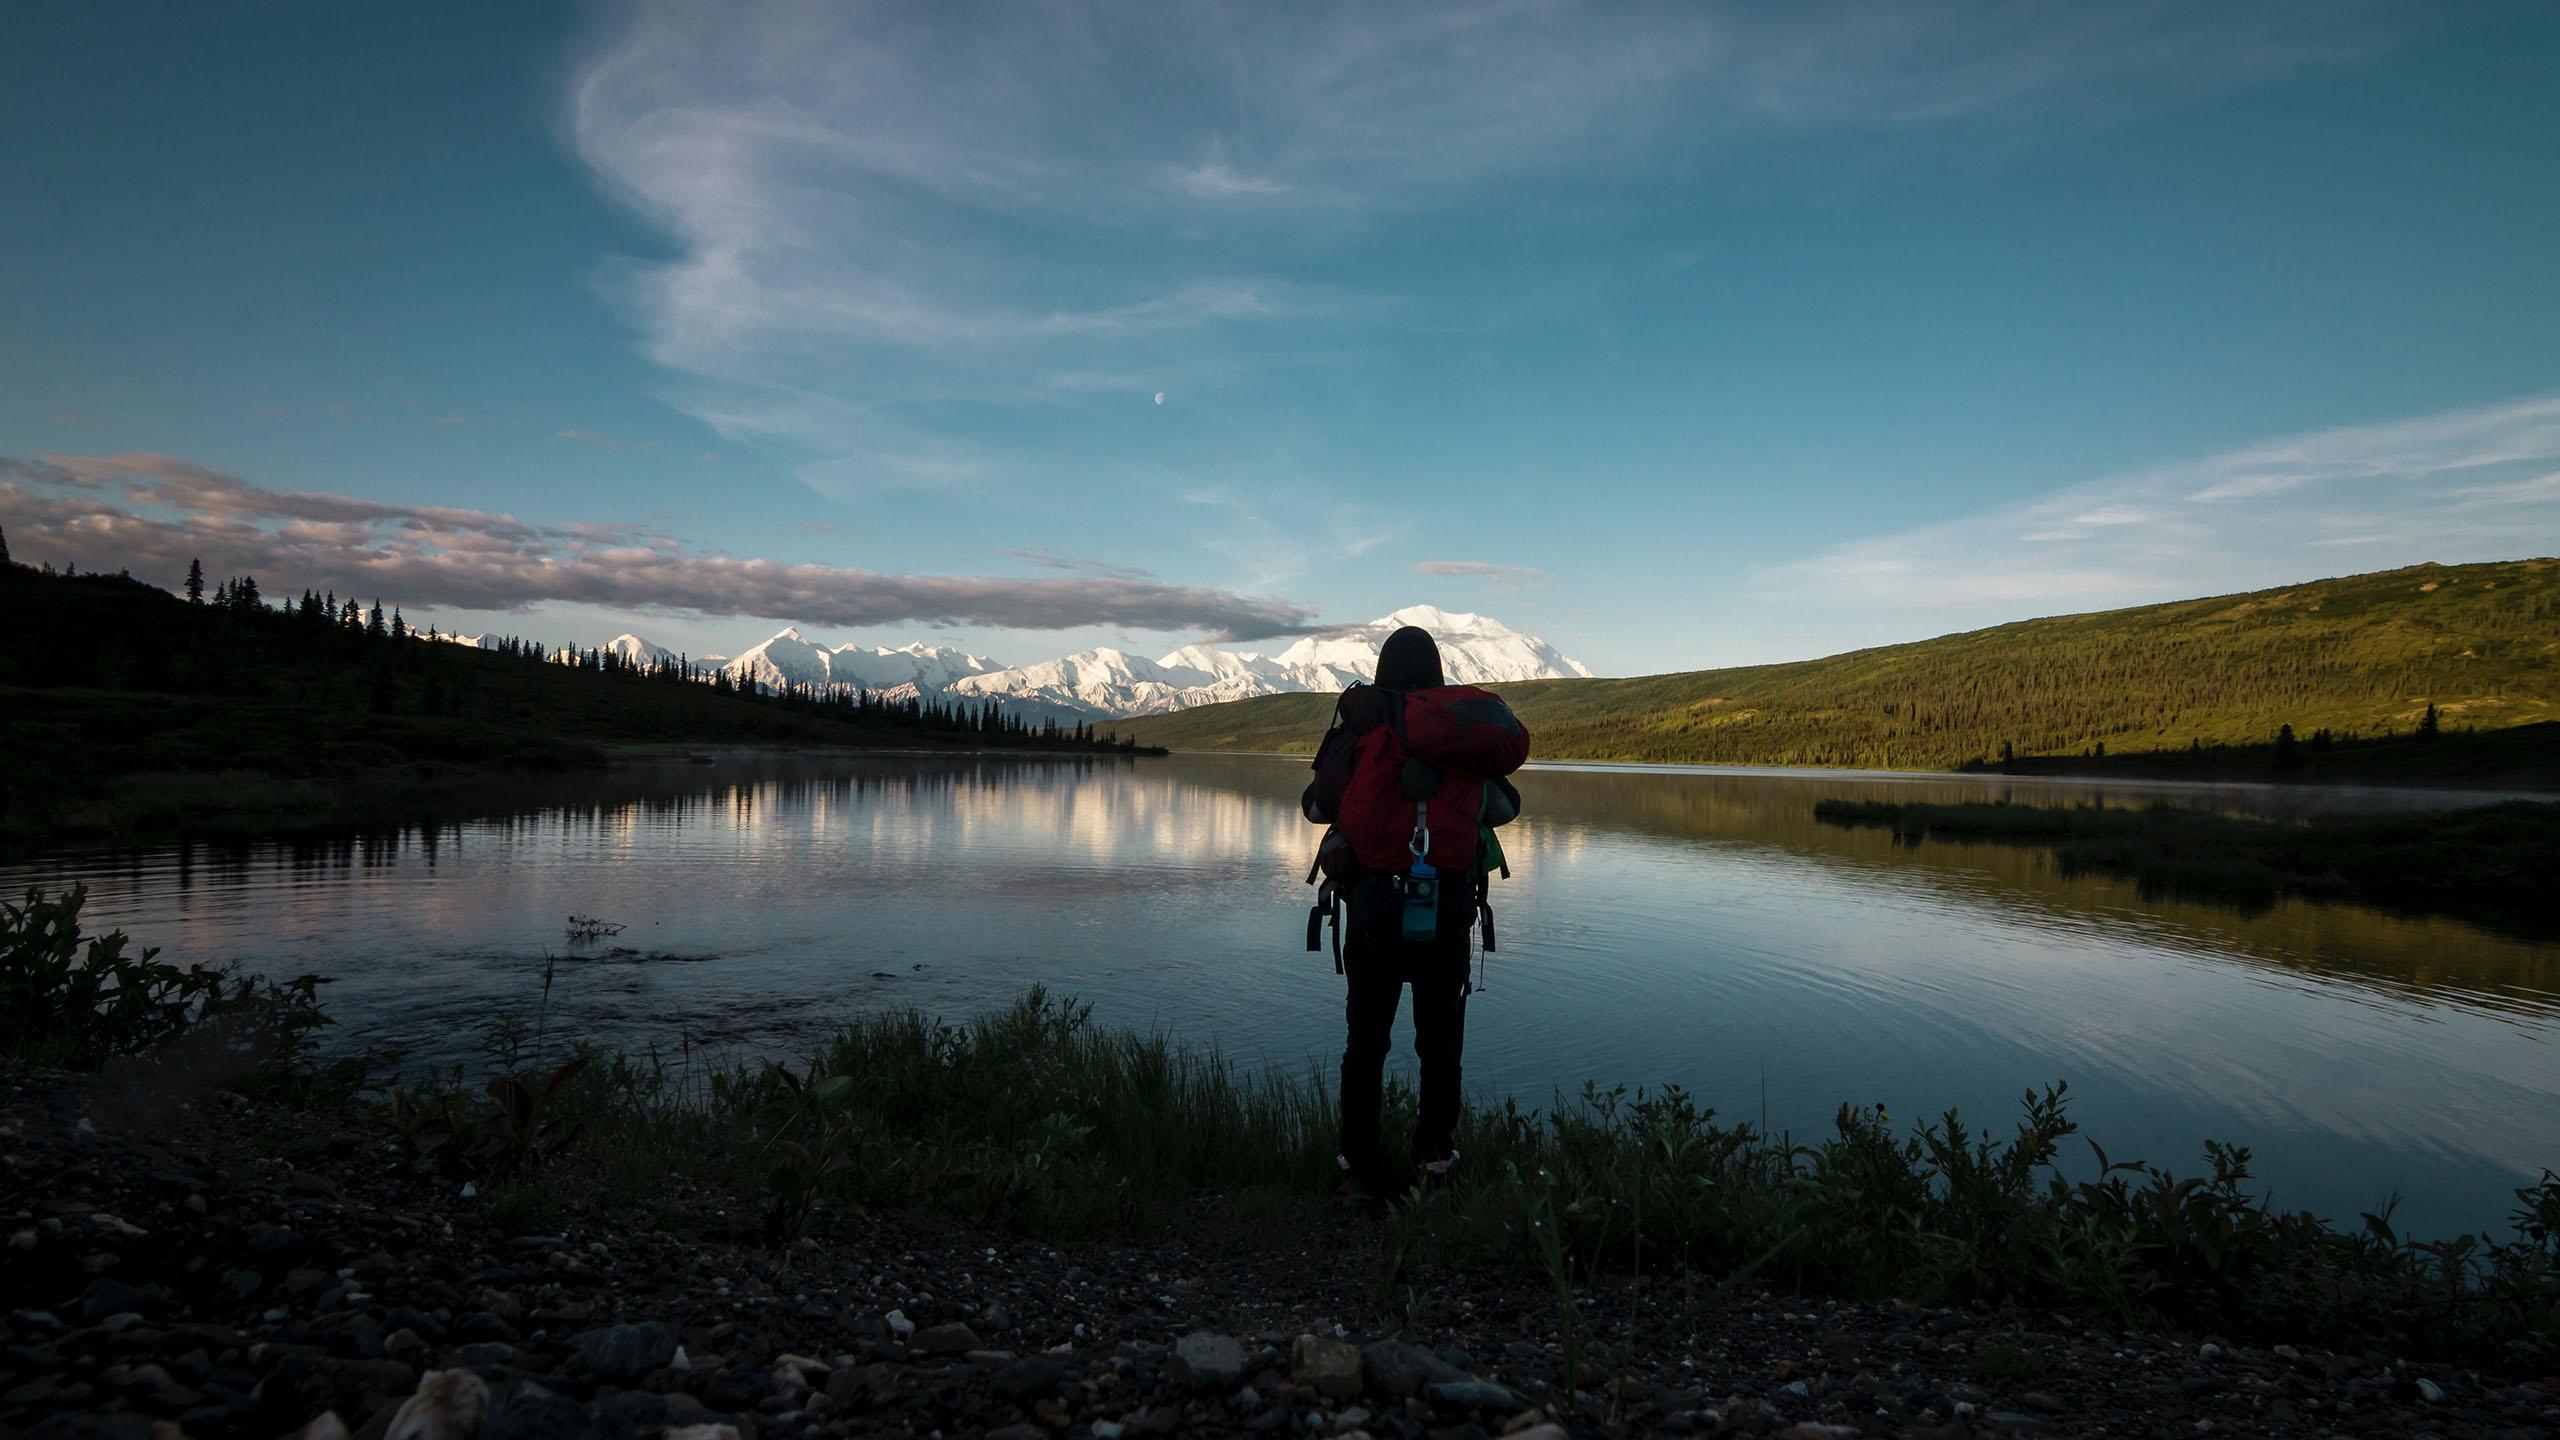 viajero, paisaje, viaje